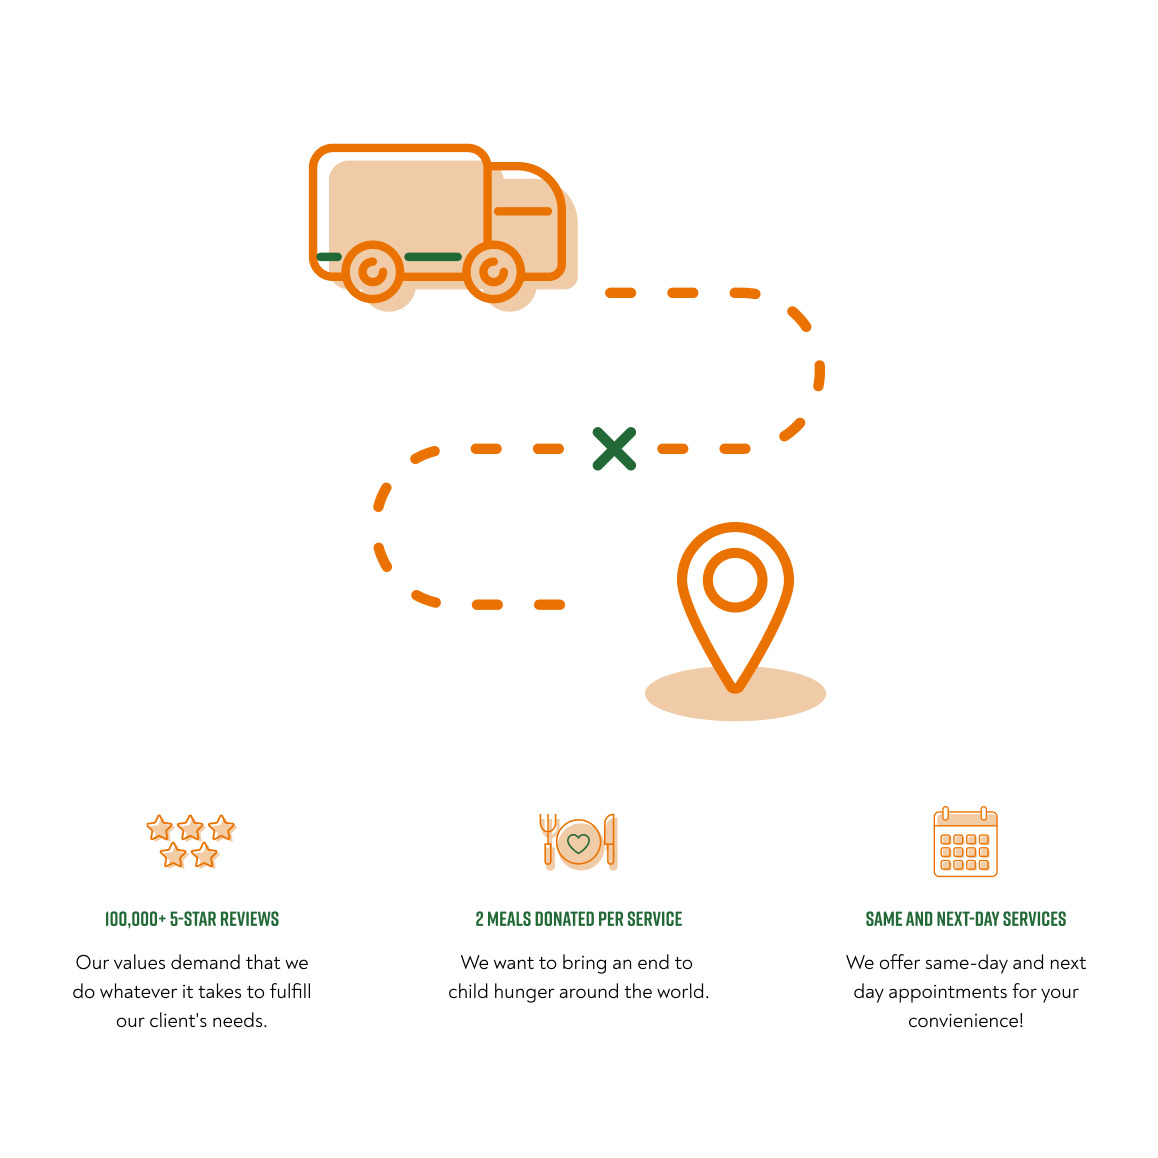 CHHJ web portal design case study